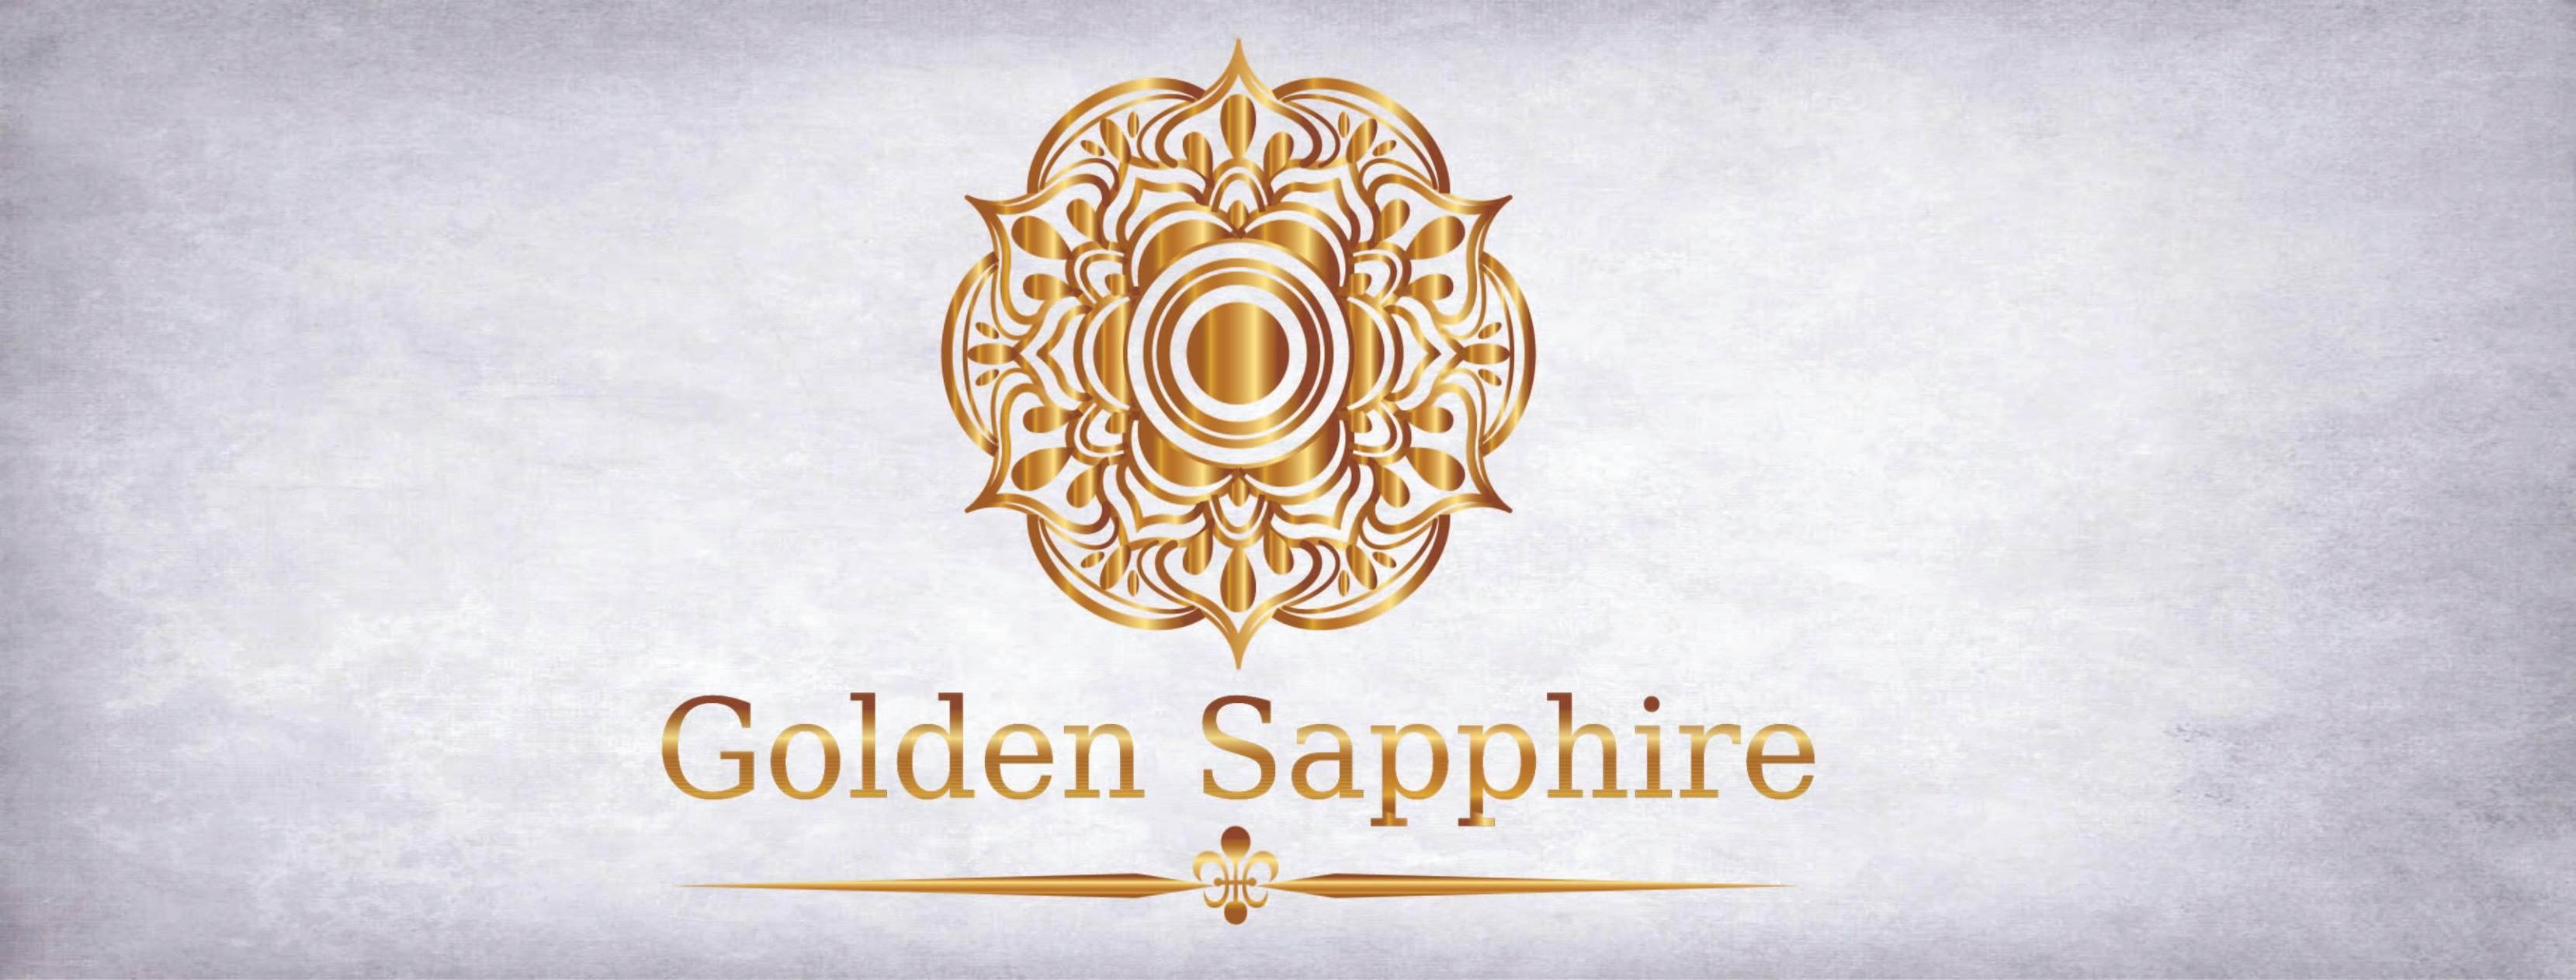 Golden Sapphire FB logo.jpg